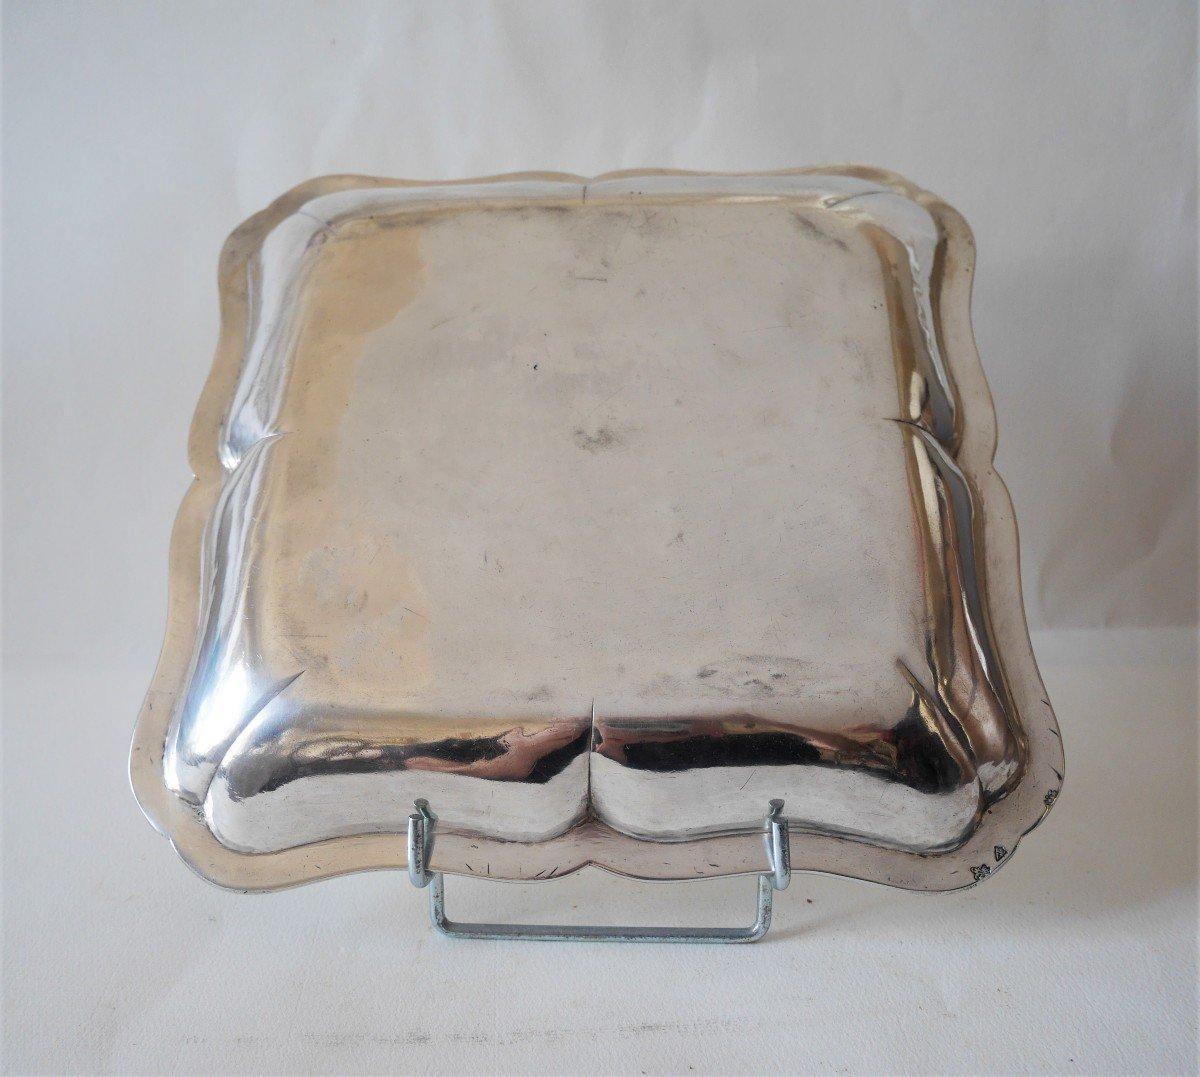 Dish, Sterling Silver By Jean-antoine Bourguet, Paris, 1760-1761-photo-3